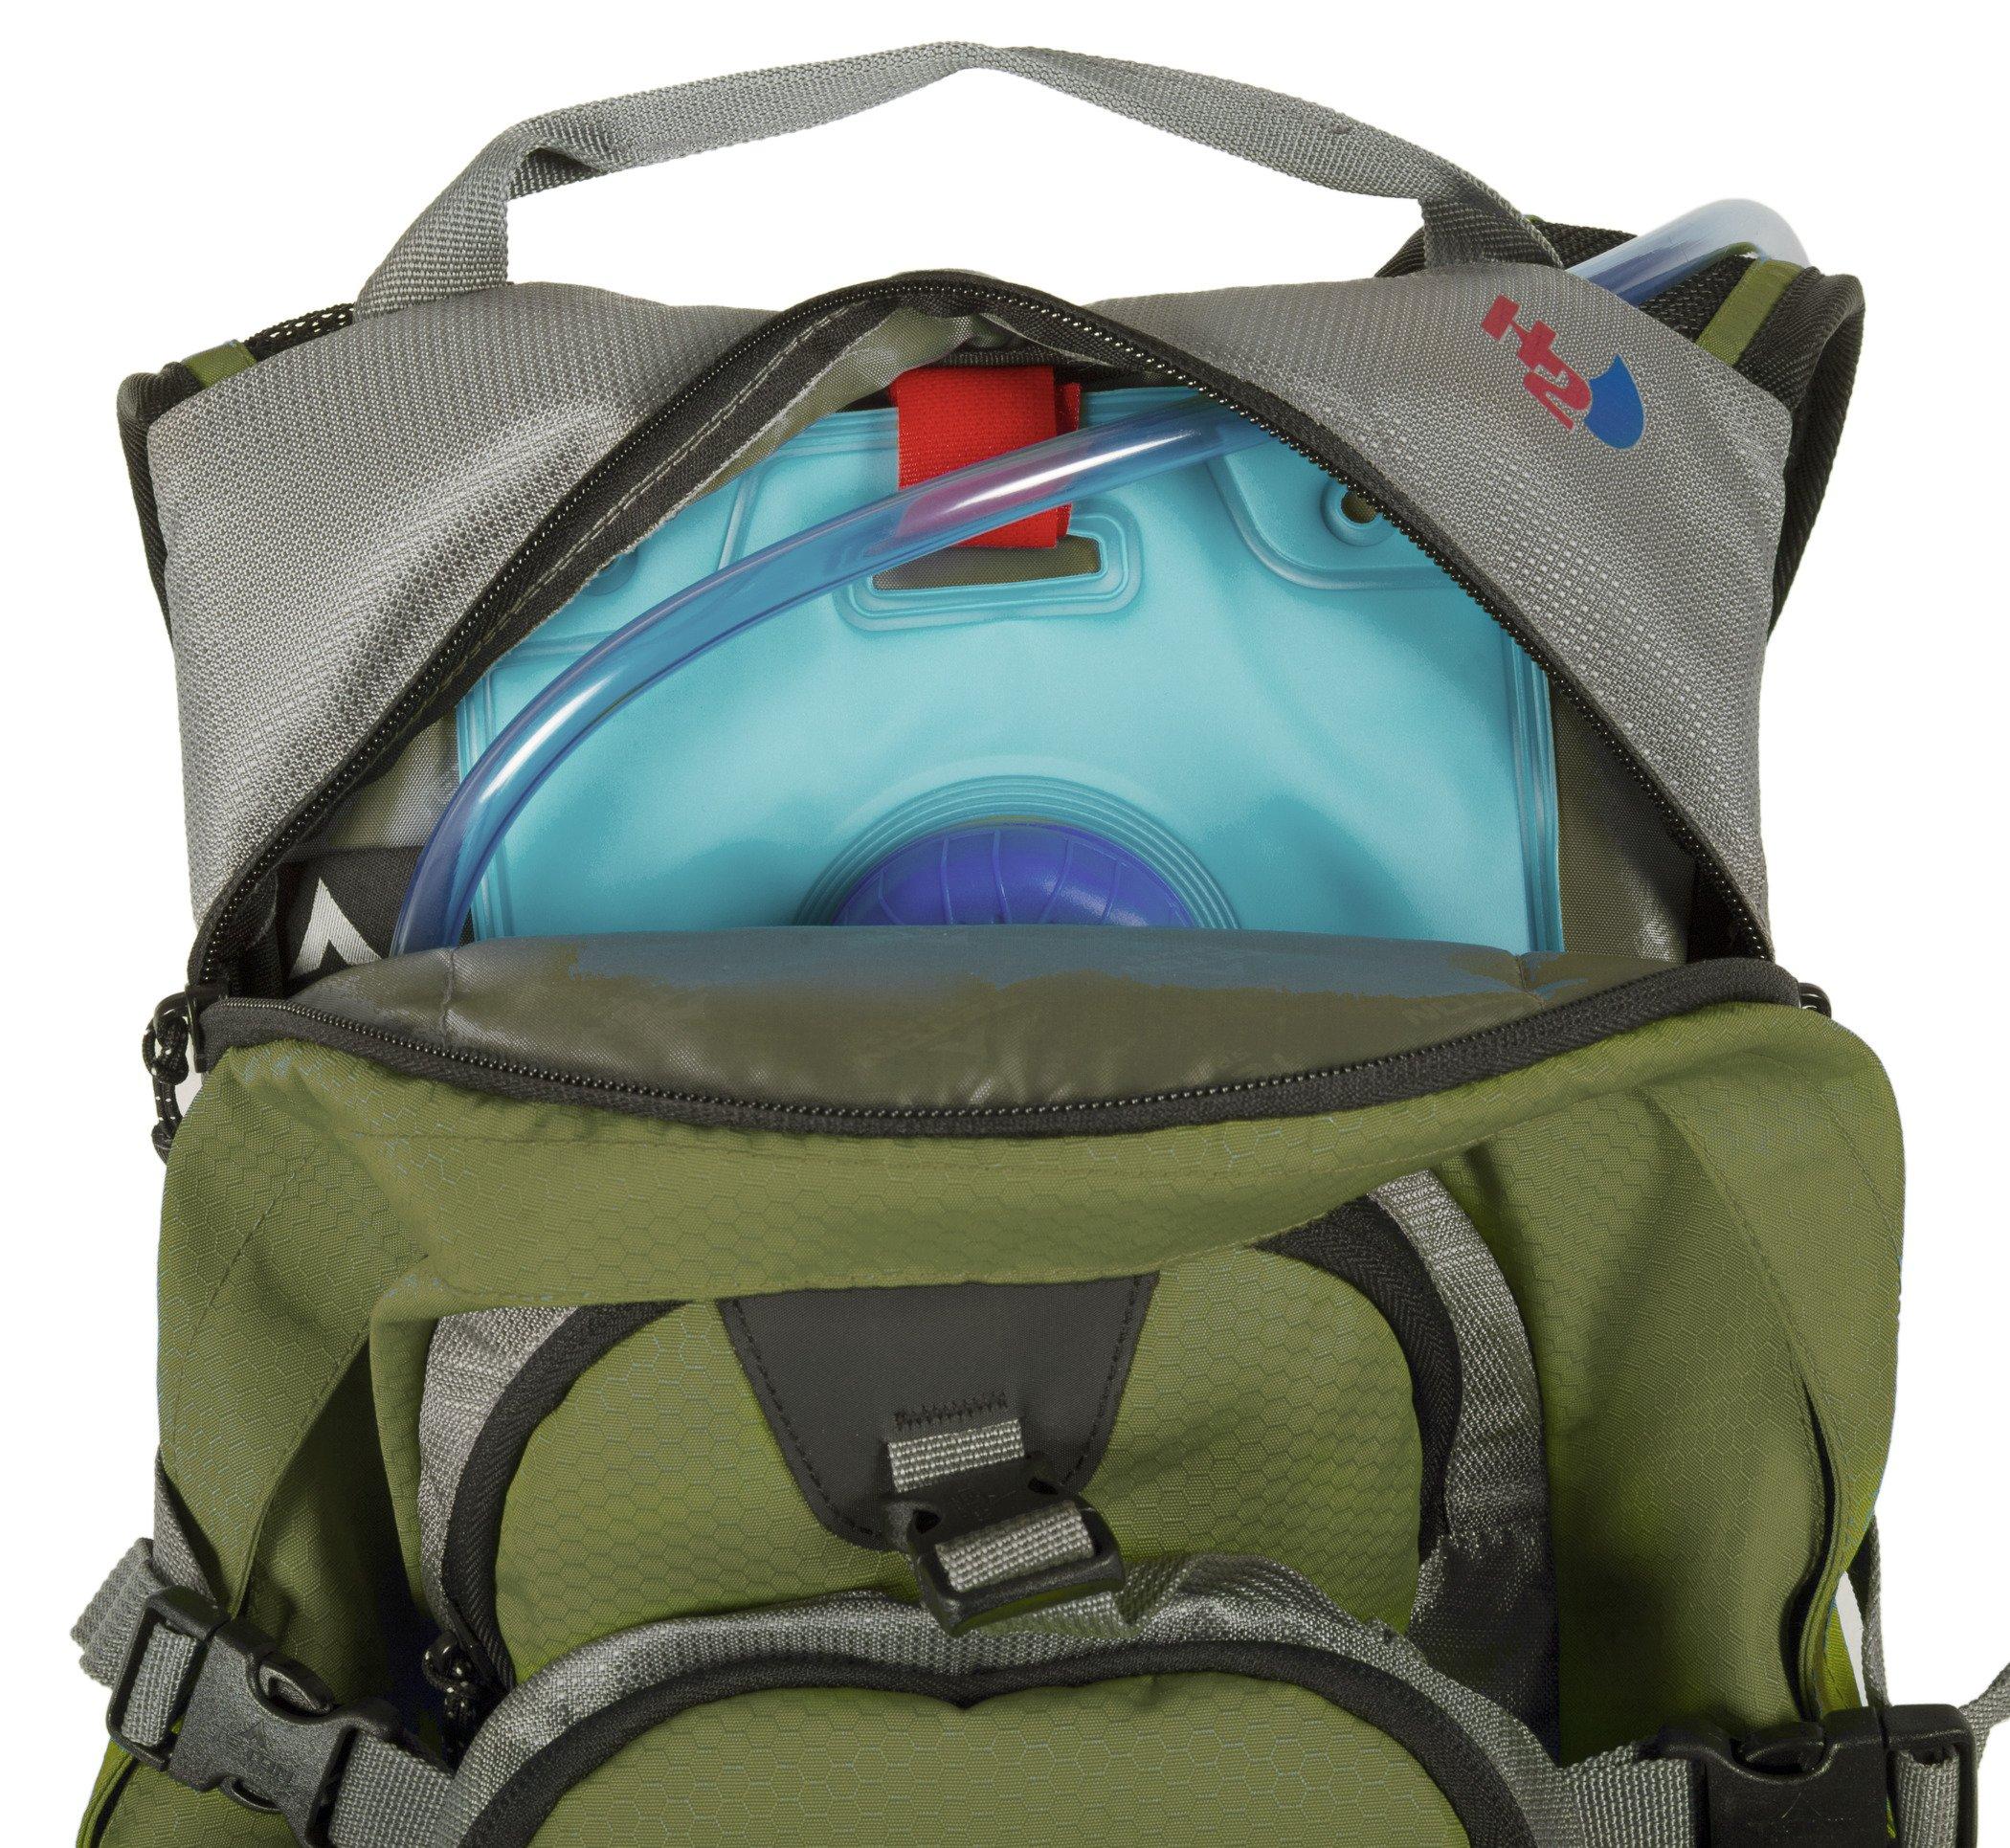 TETON Sports Oasis 1100 Hydration PackFree 2-Liter Hydration Bladder